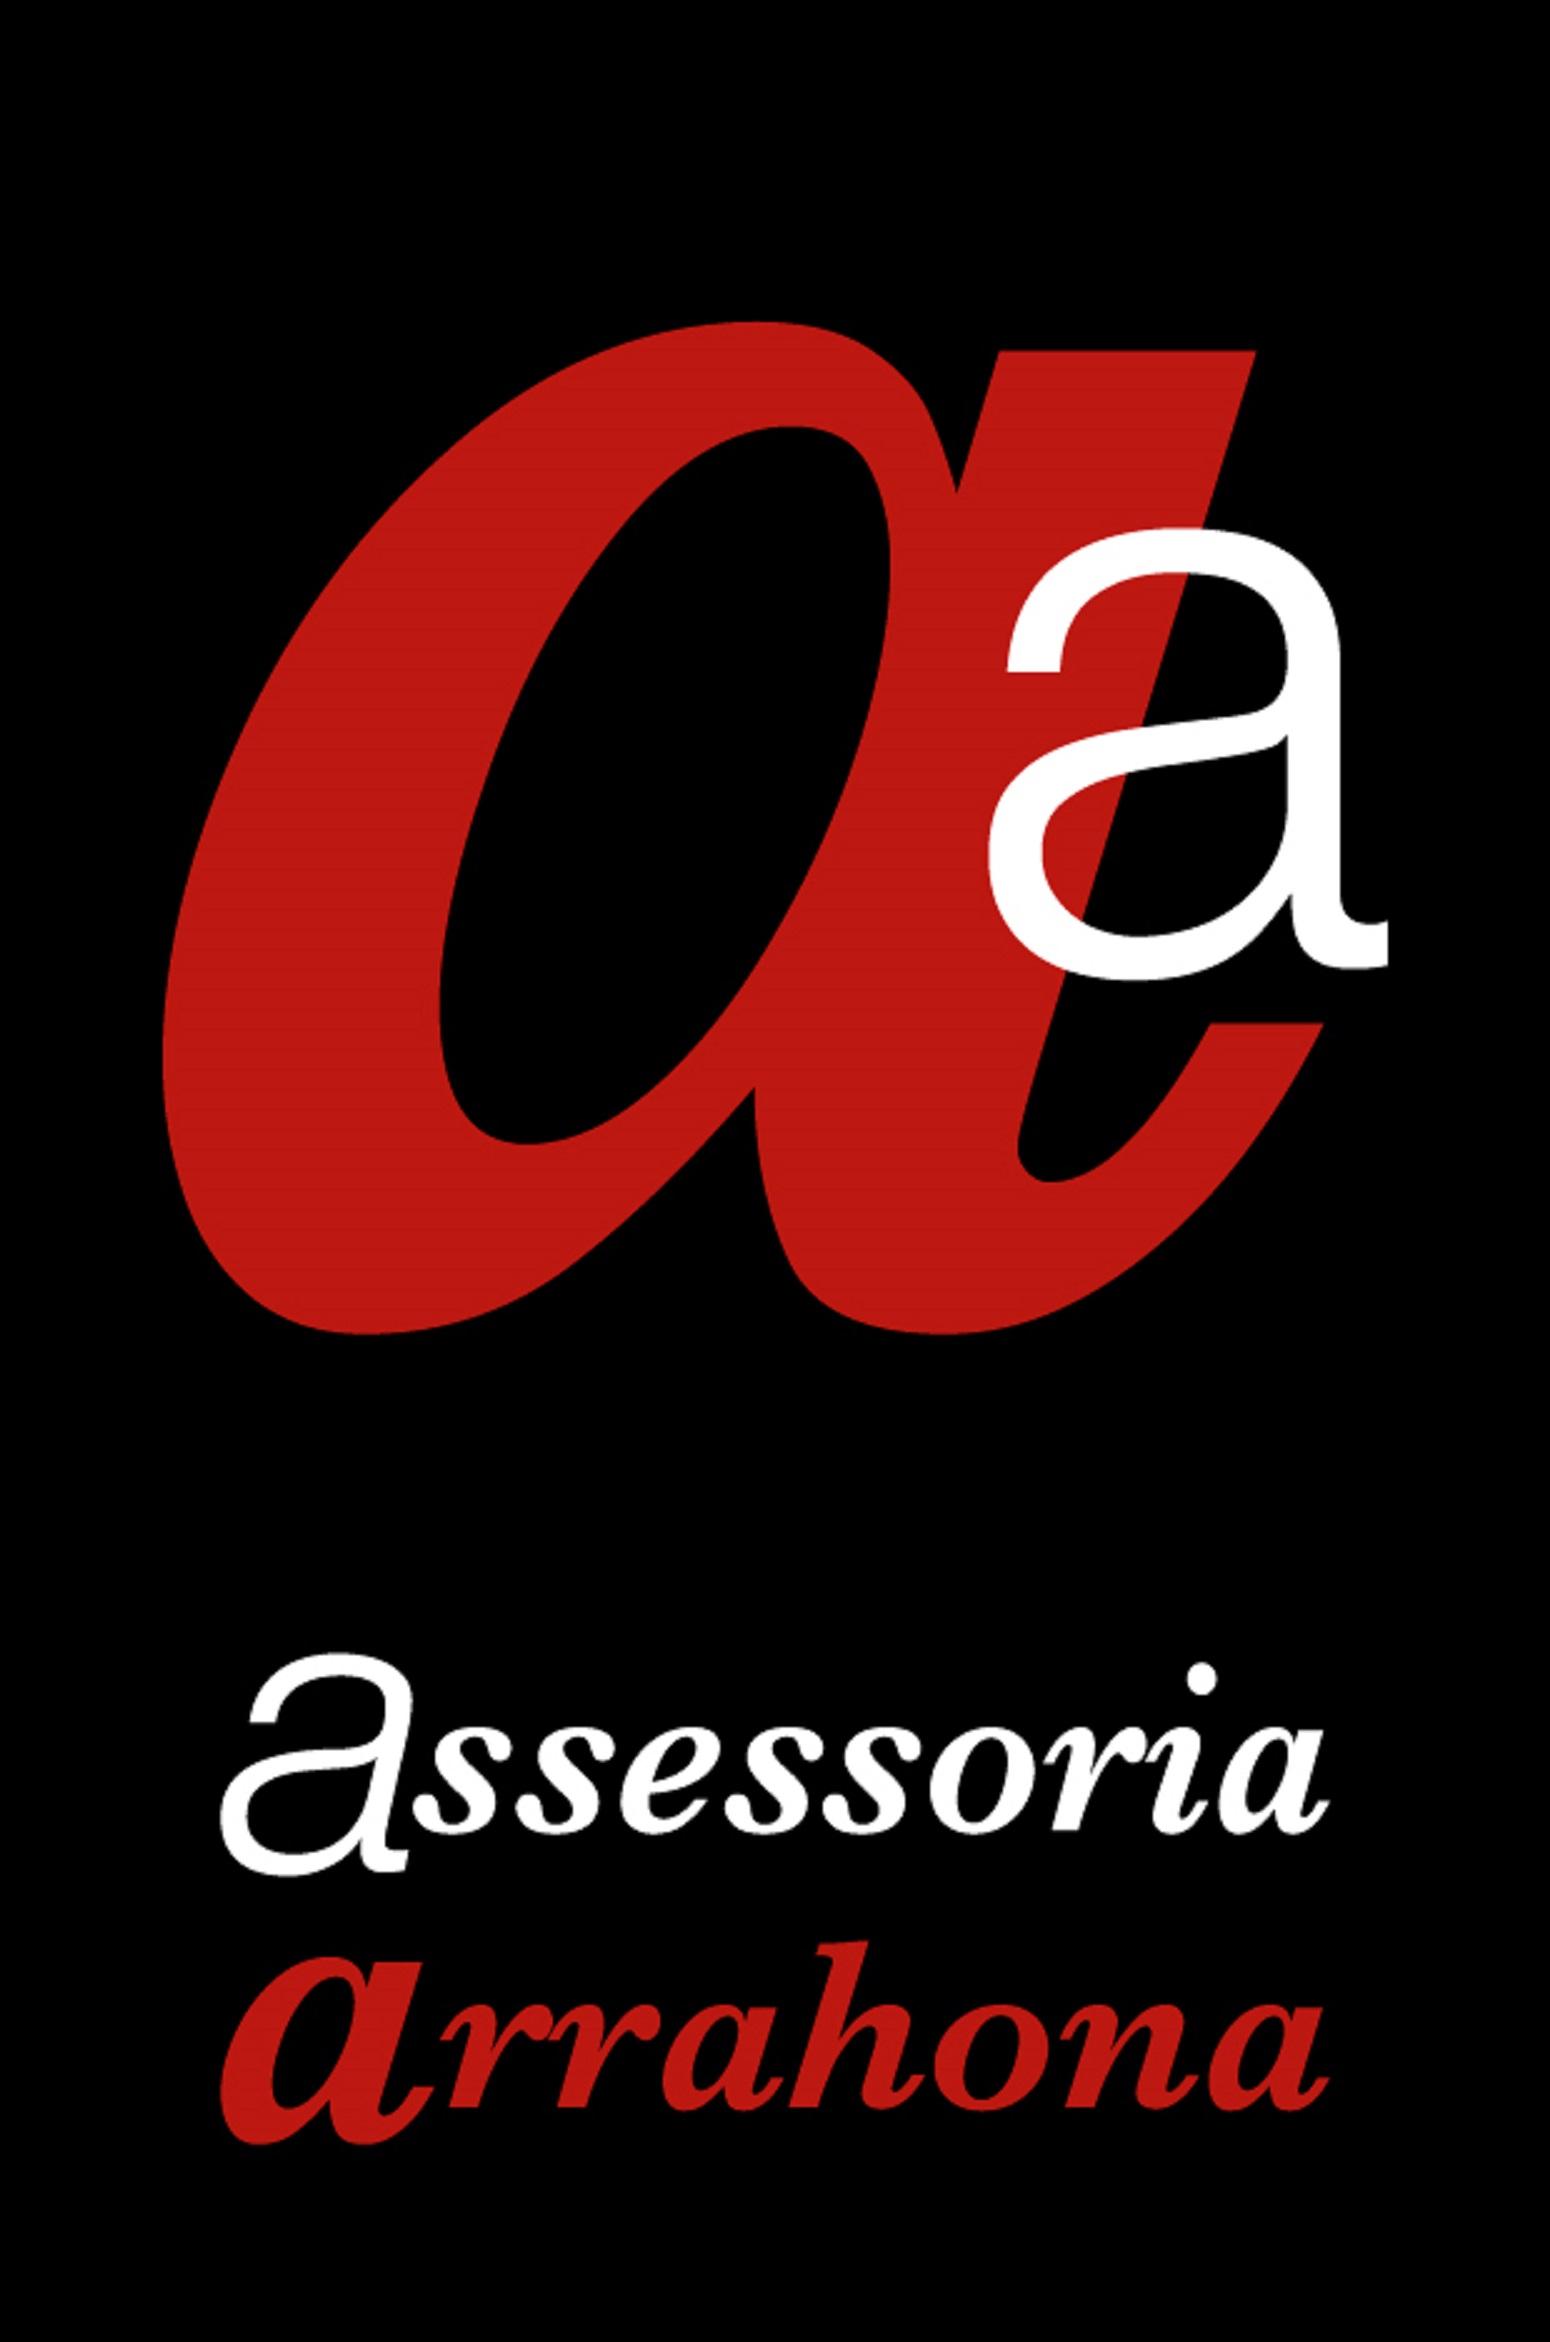 Asesoría Arrahona